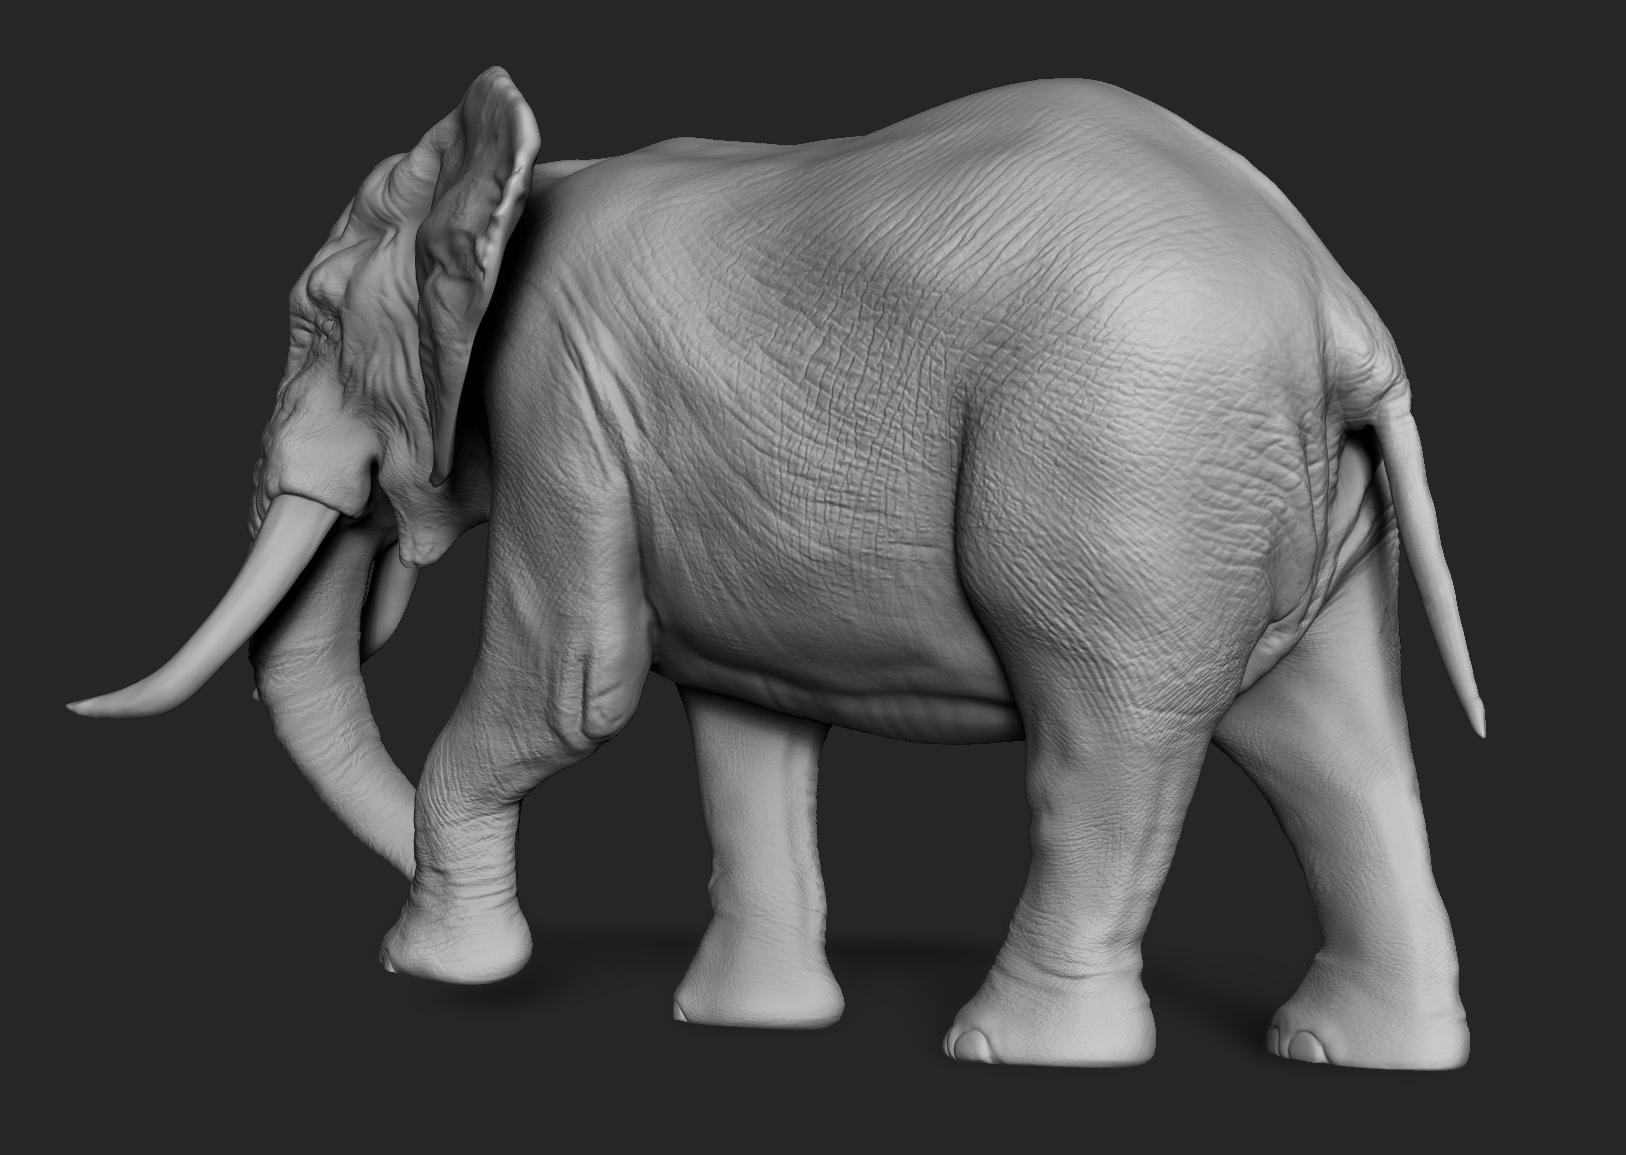 Elephant (First Bank 2014)